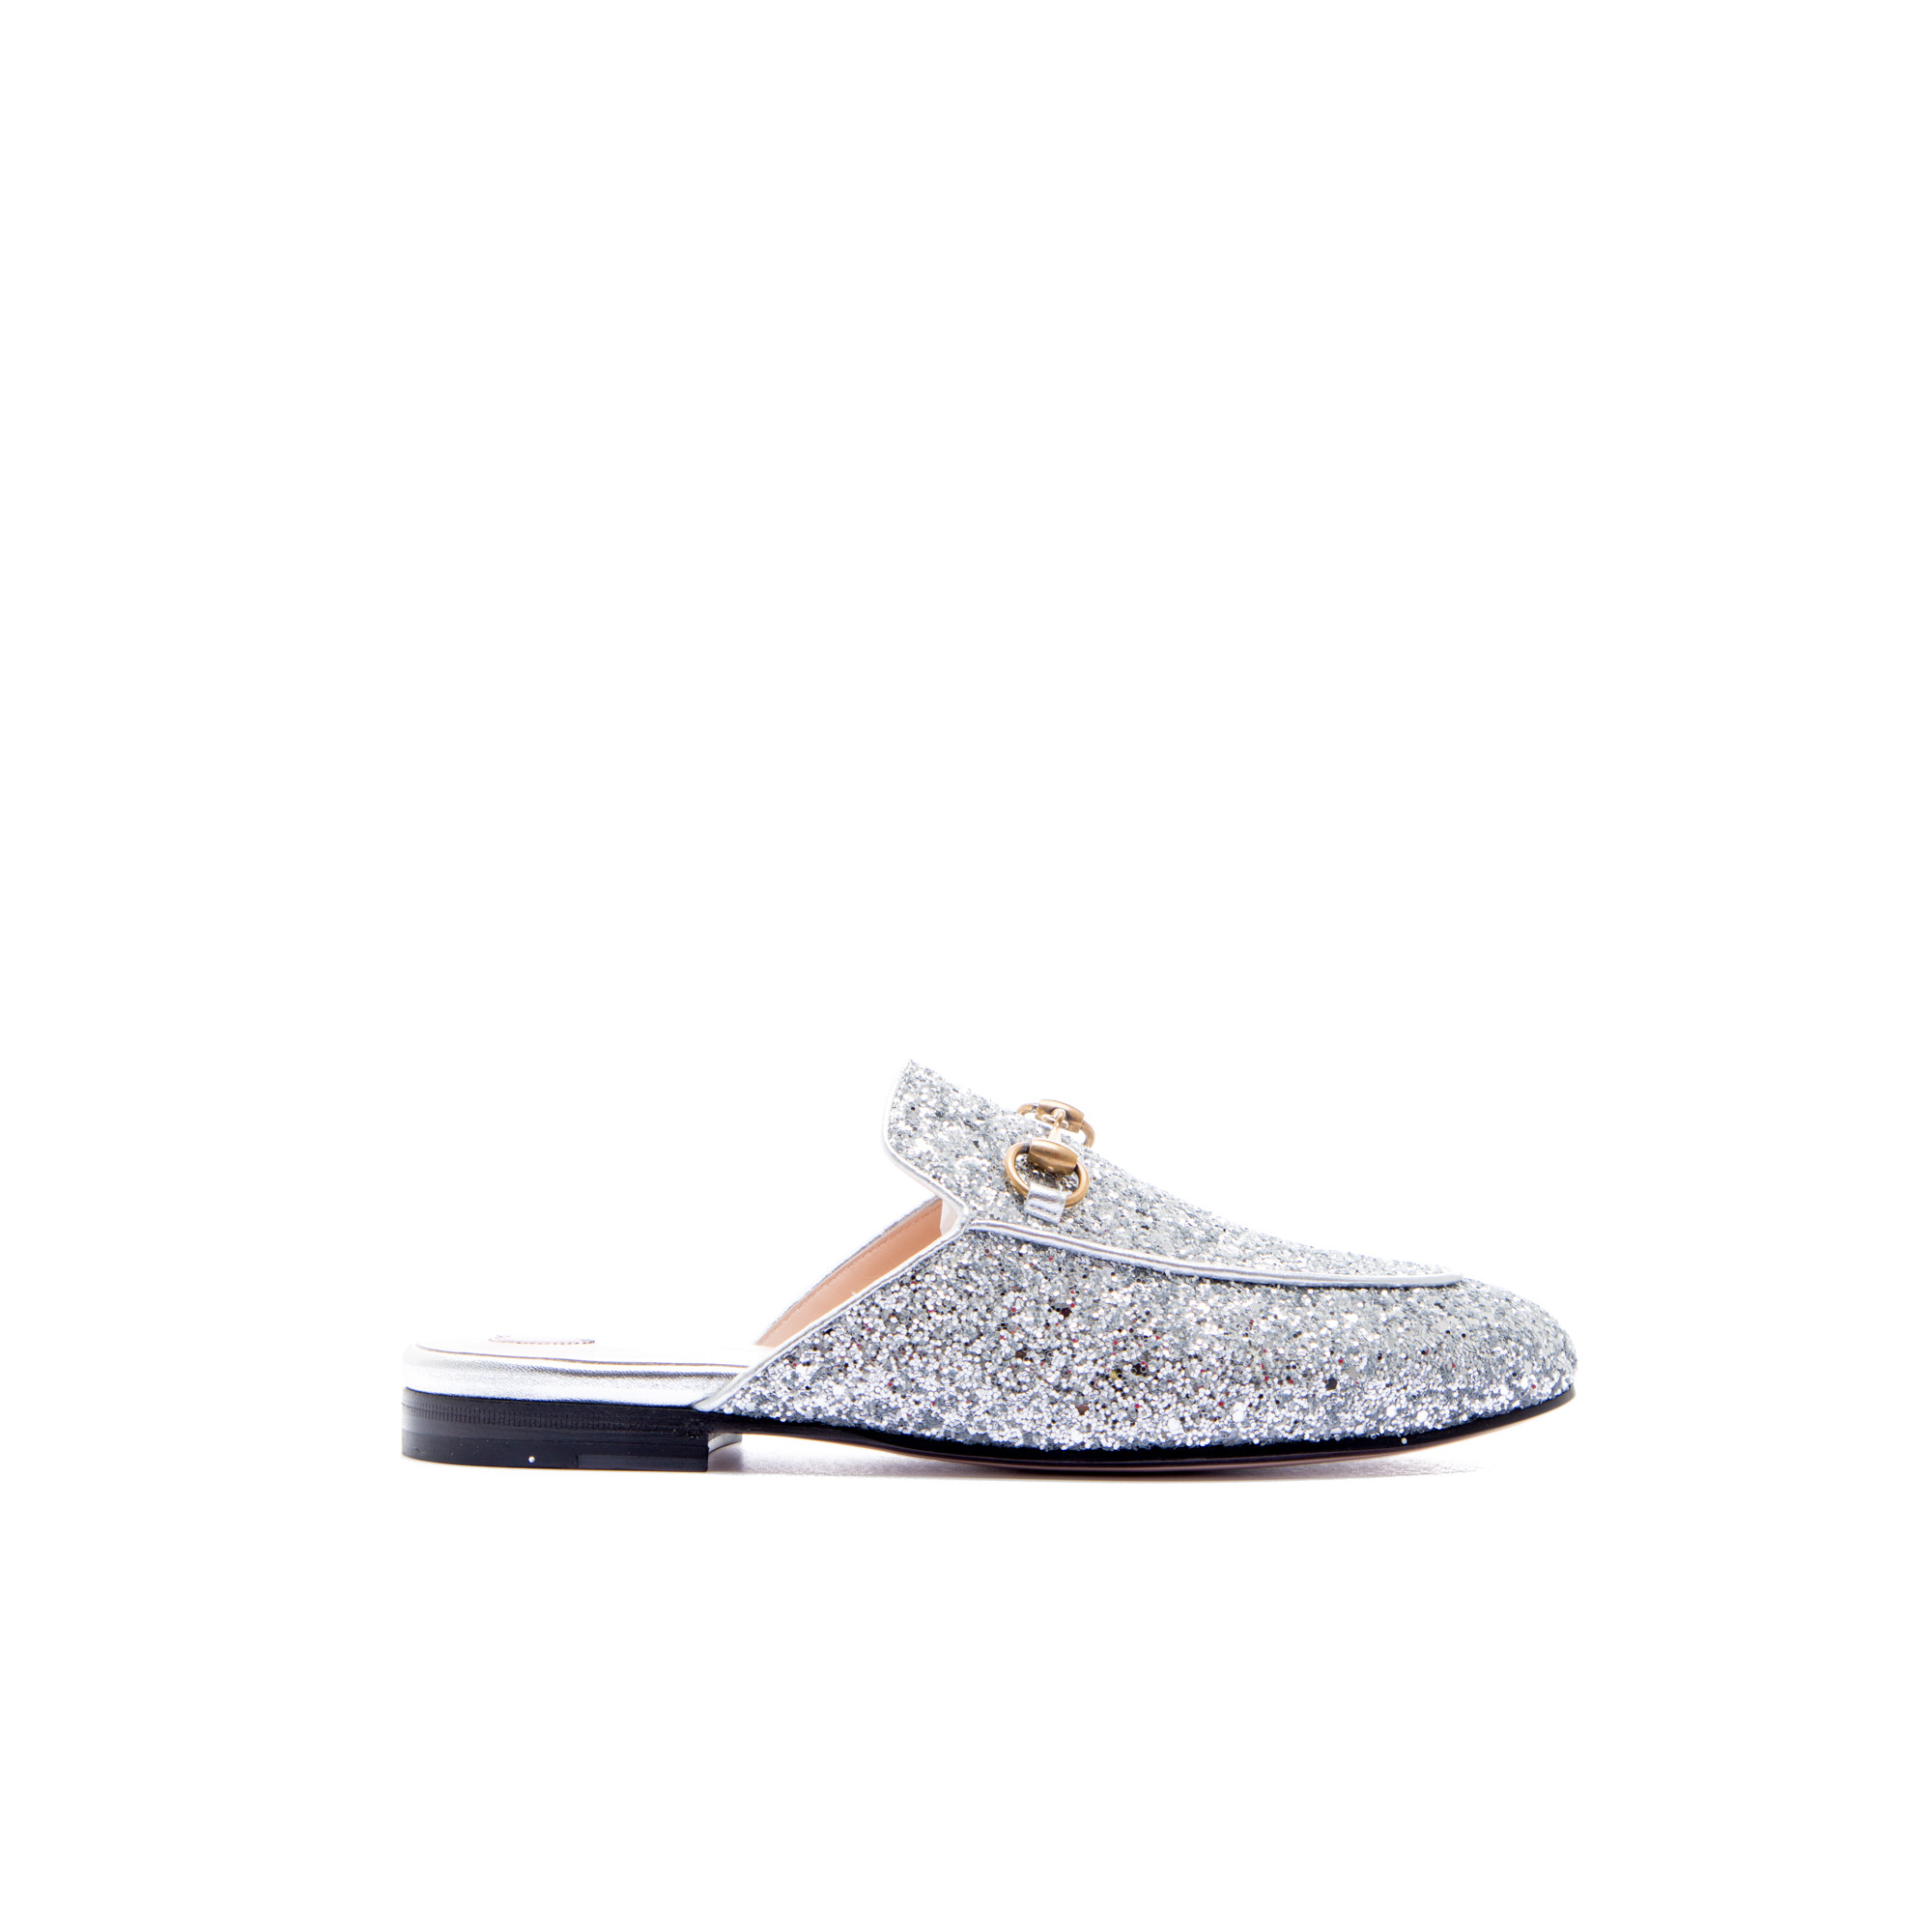 50dd49293a8 gucci schoenen dames sale